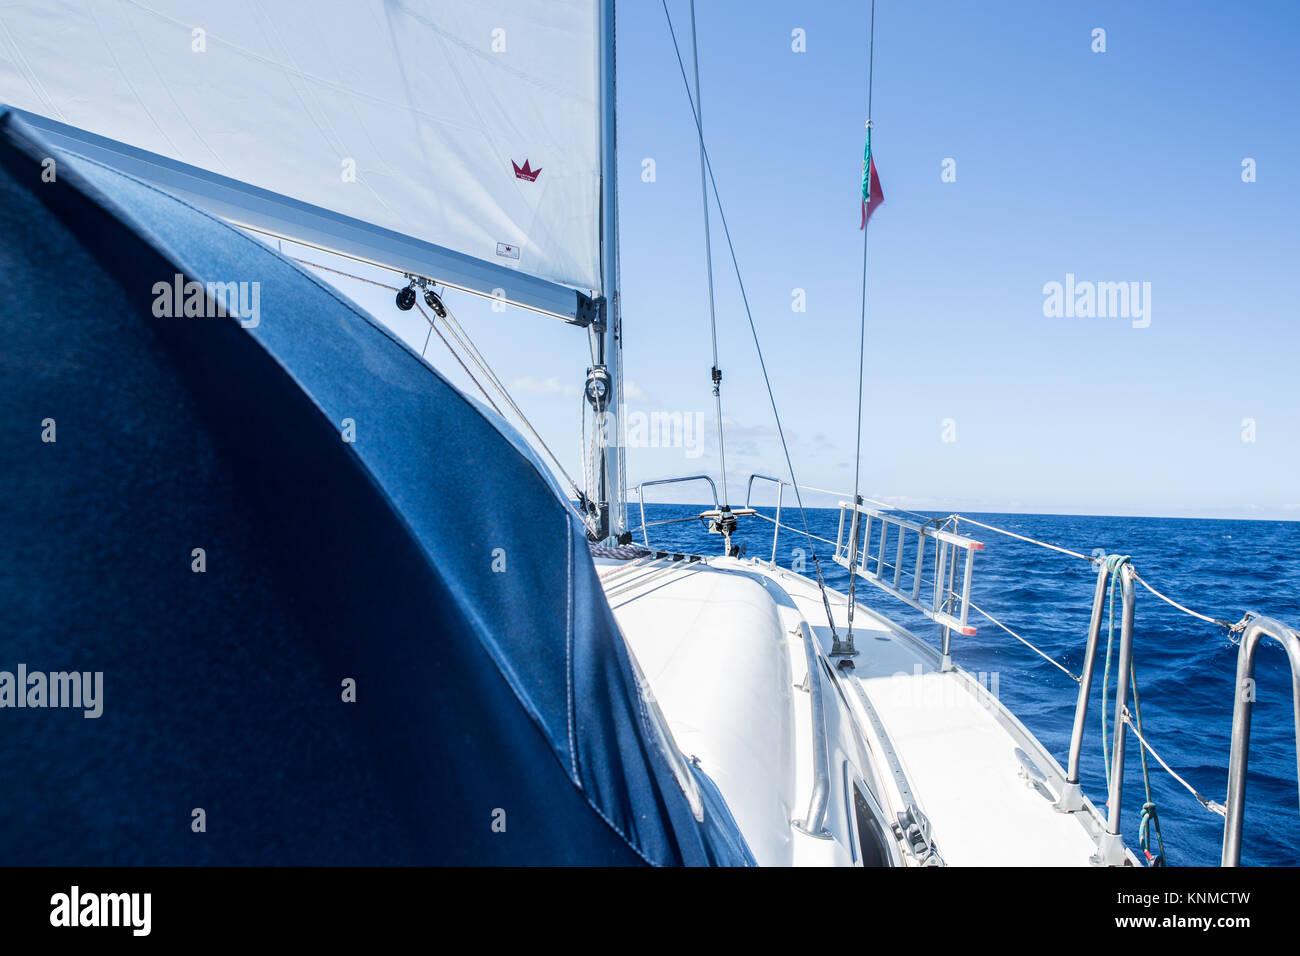 Segelboot auf dem atlantischen Ozean - Sailboot on the atlantic ocean - Stock Image